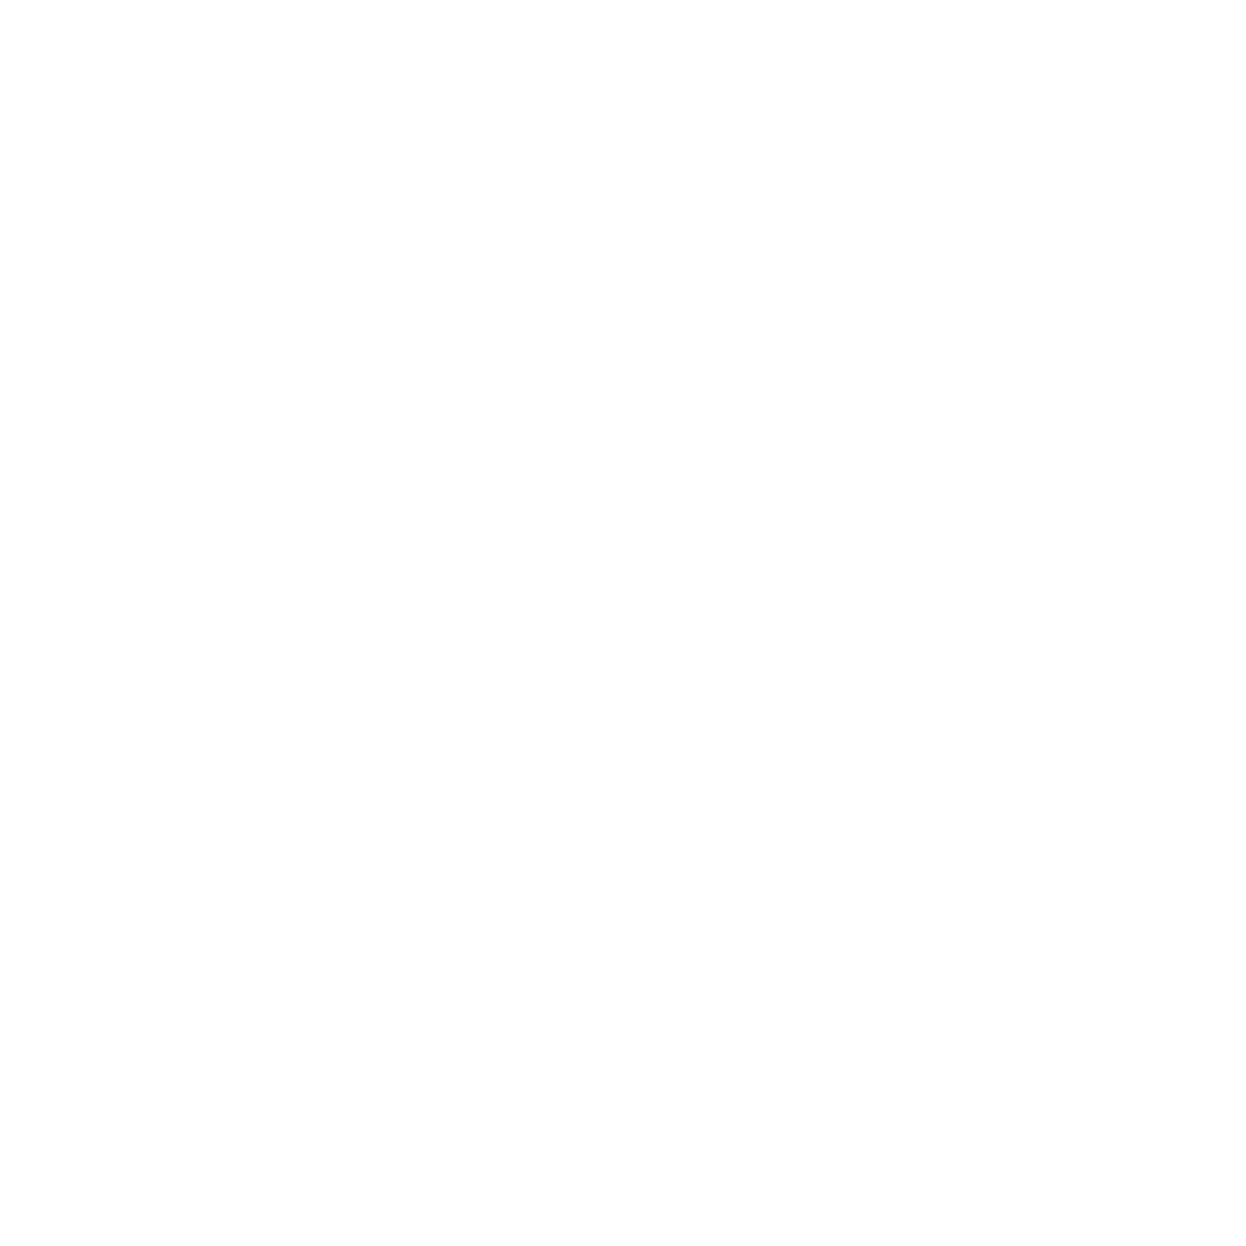 Logo UMCD Spanish (White)